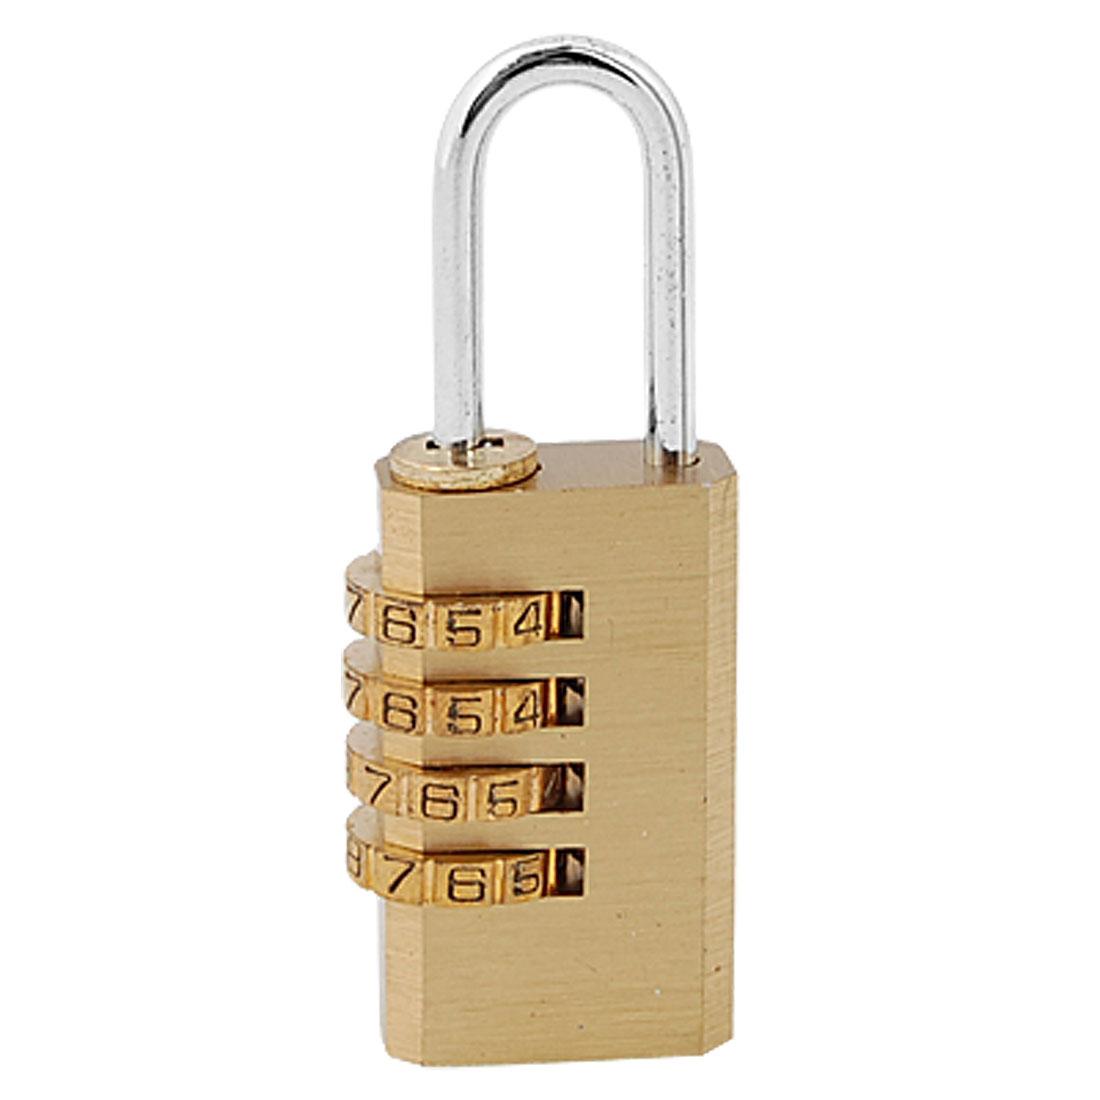 4-Digit-Bag-Travel-Lock-Resettable-Combination-Padlock